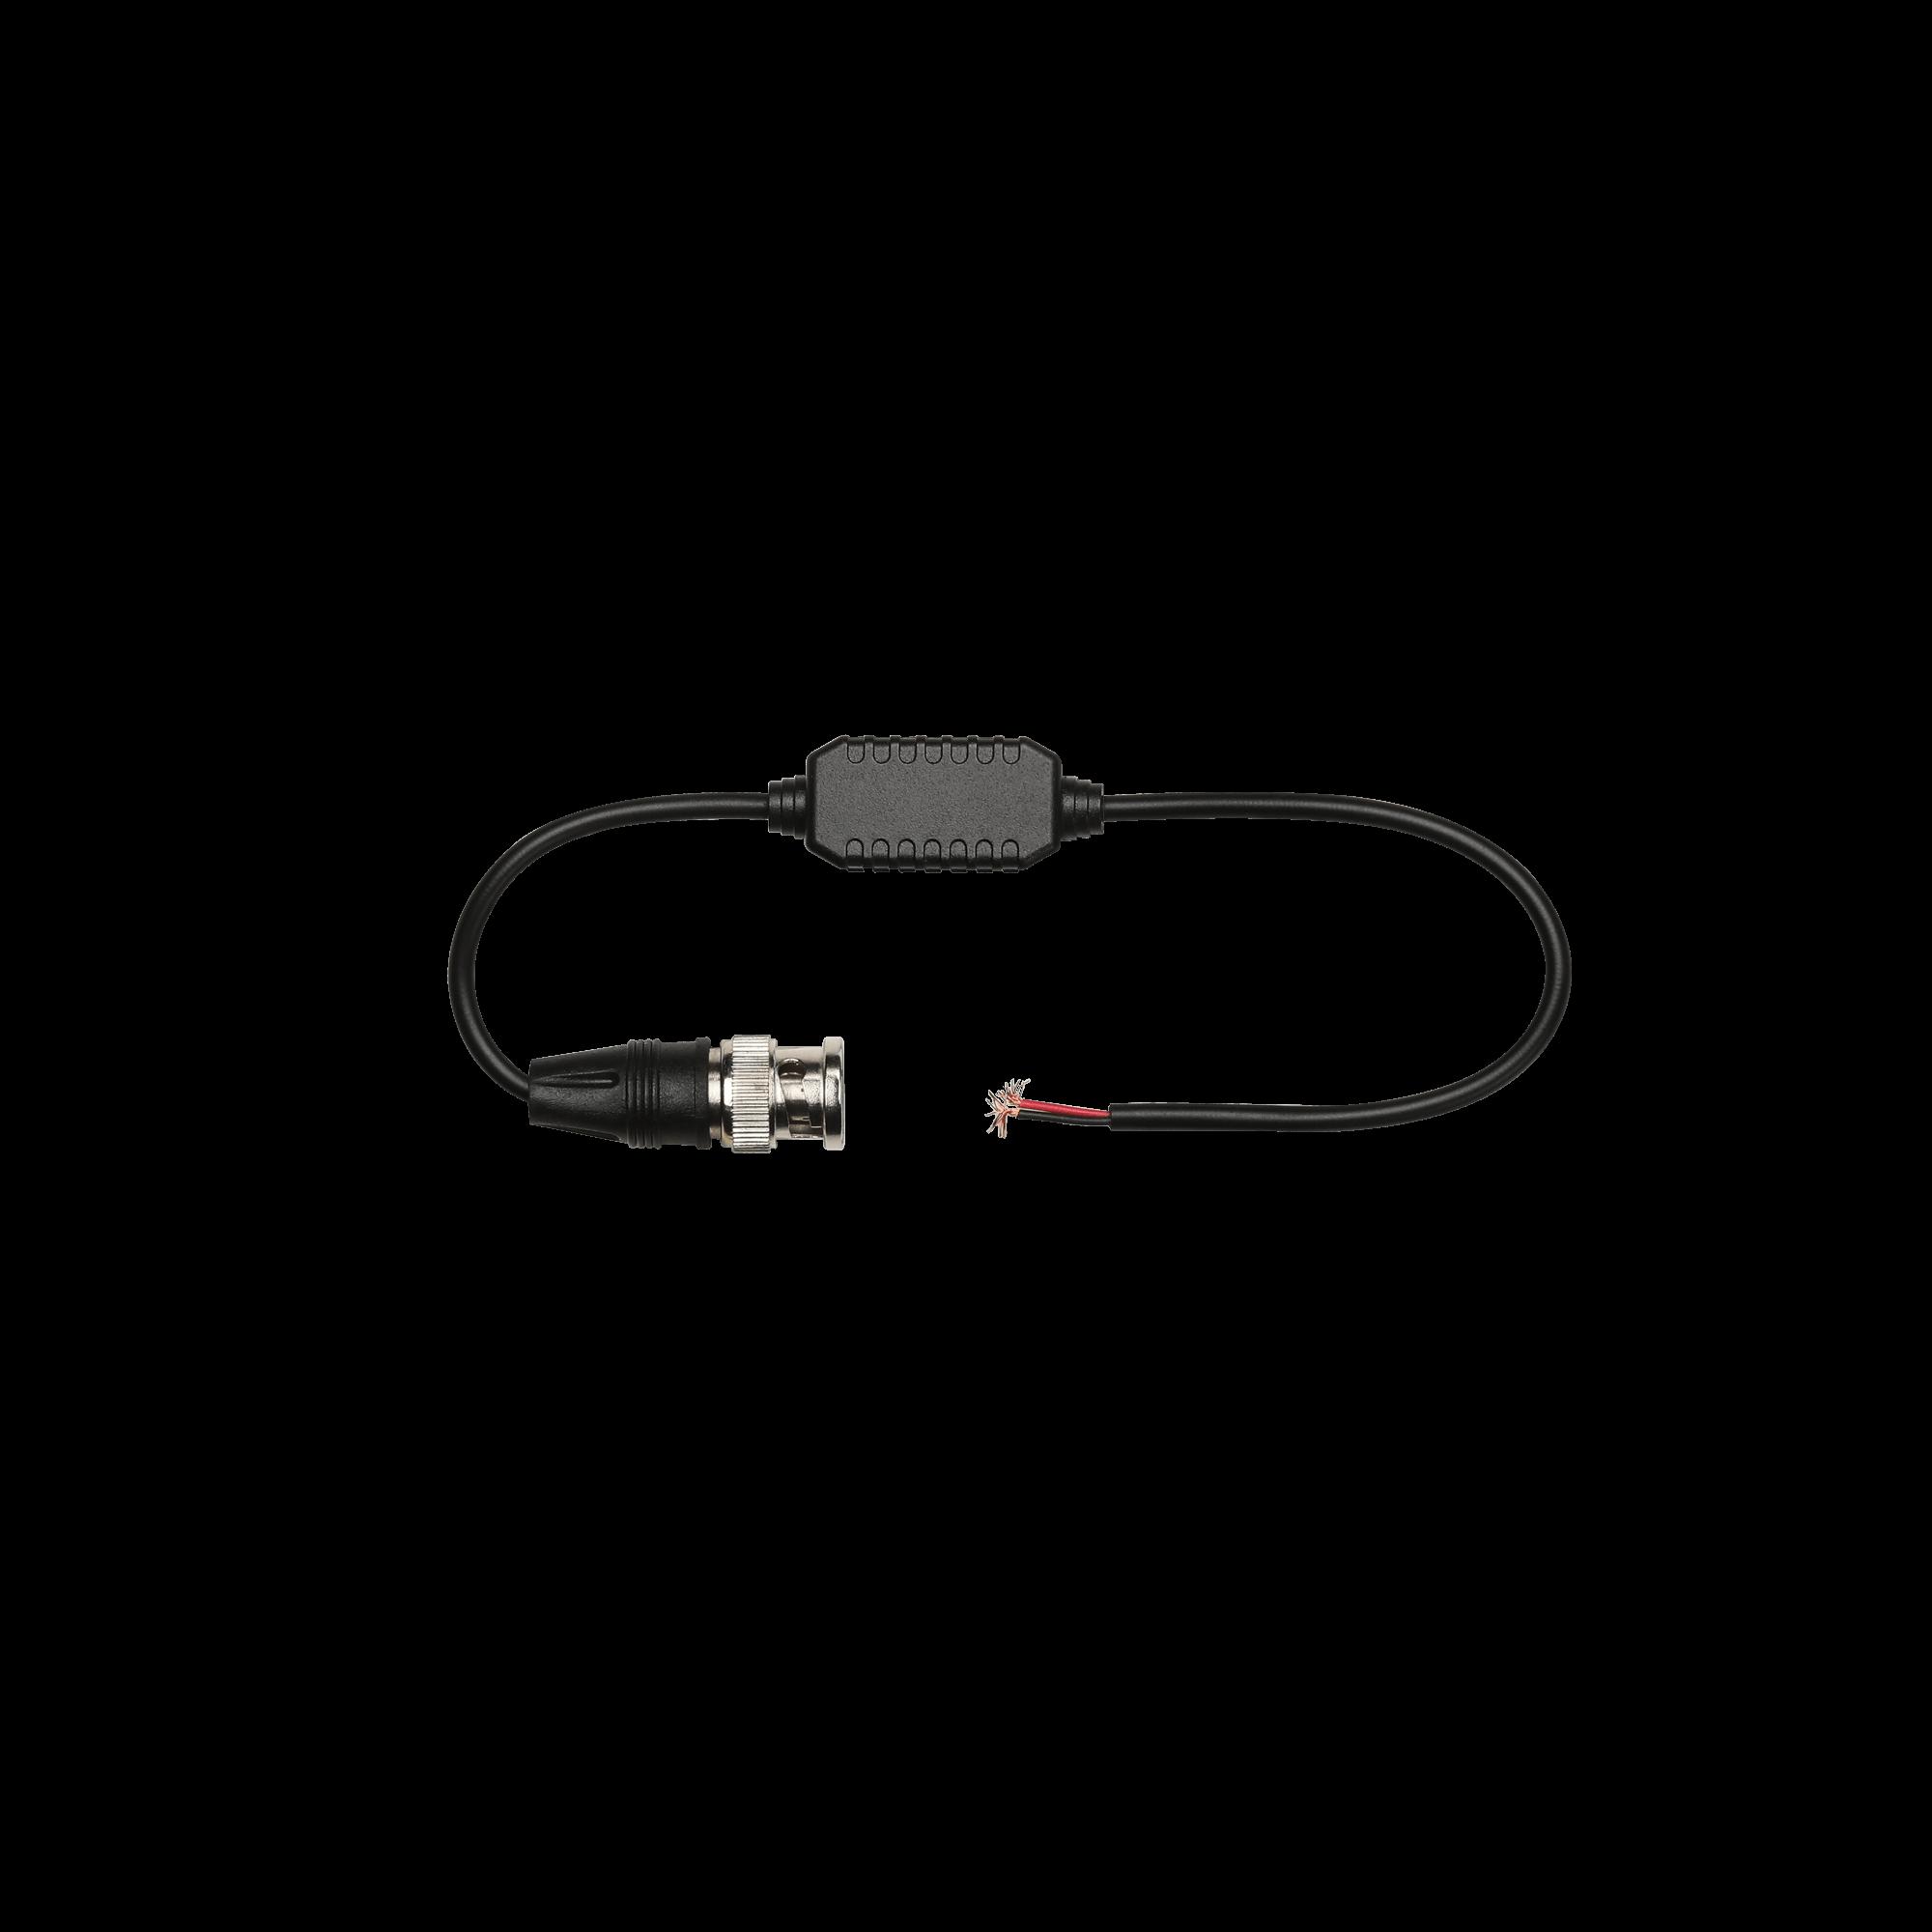 HD-TVI/AHD/HDCVI/CVBS Video Balun  with Bare Wire